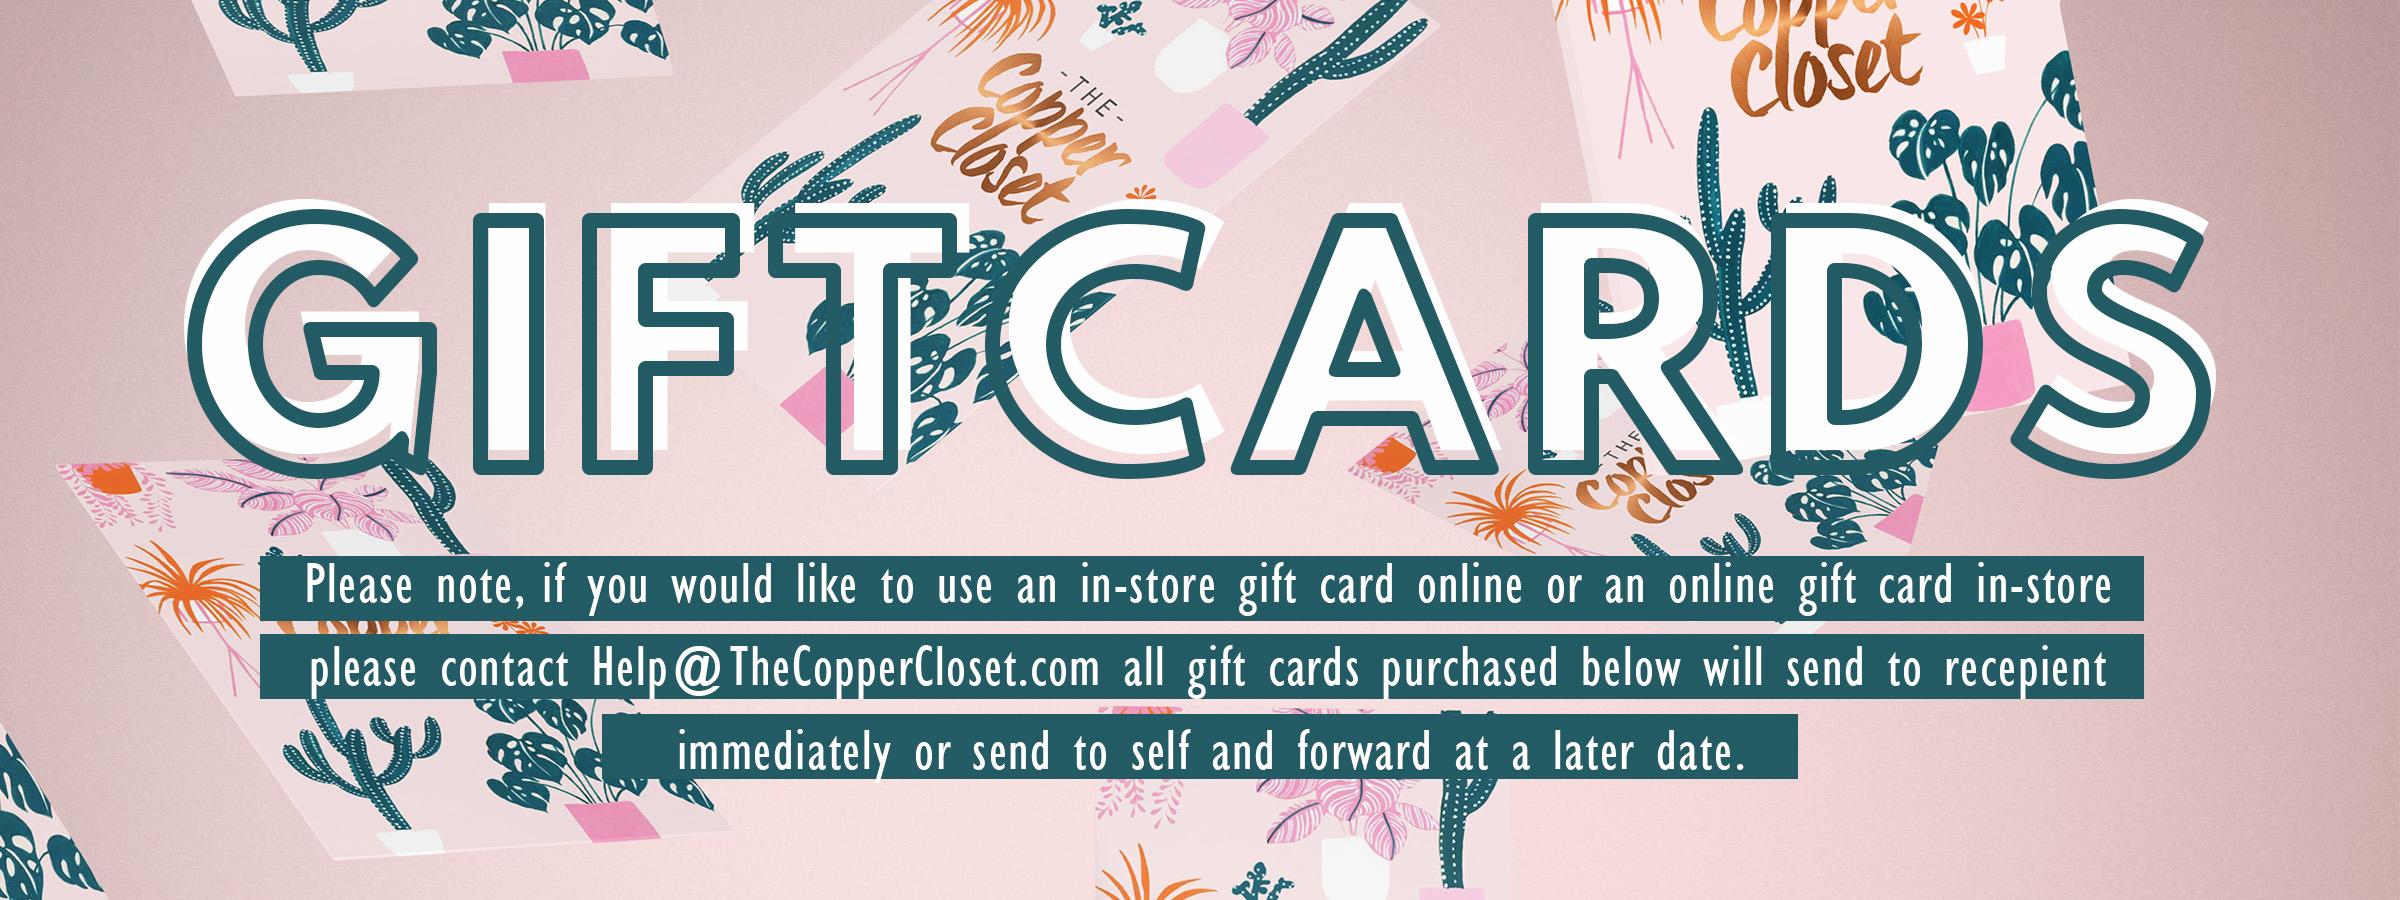 Gift Certificates The Copper Closet